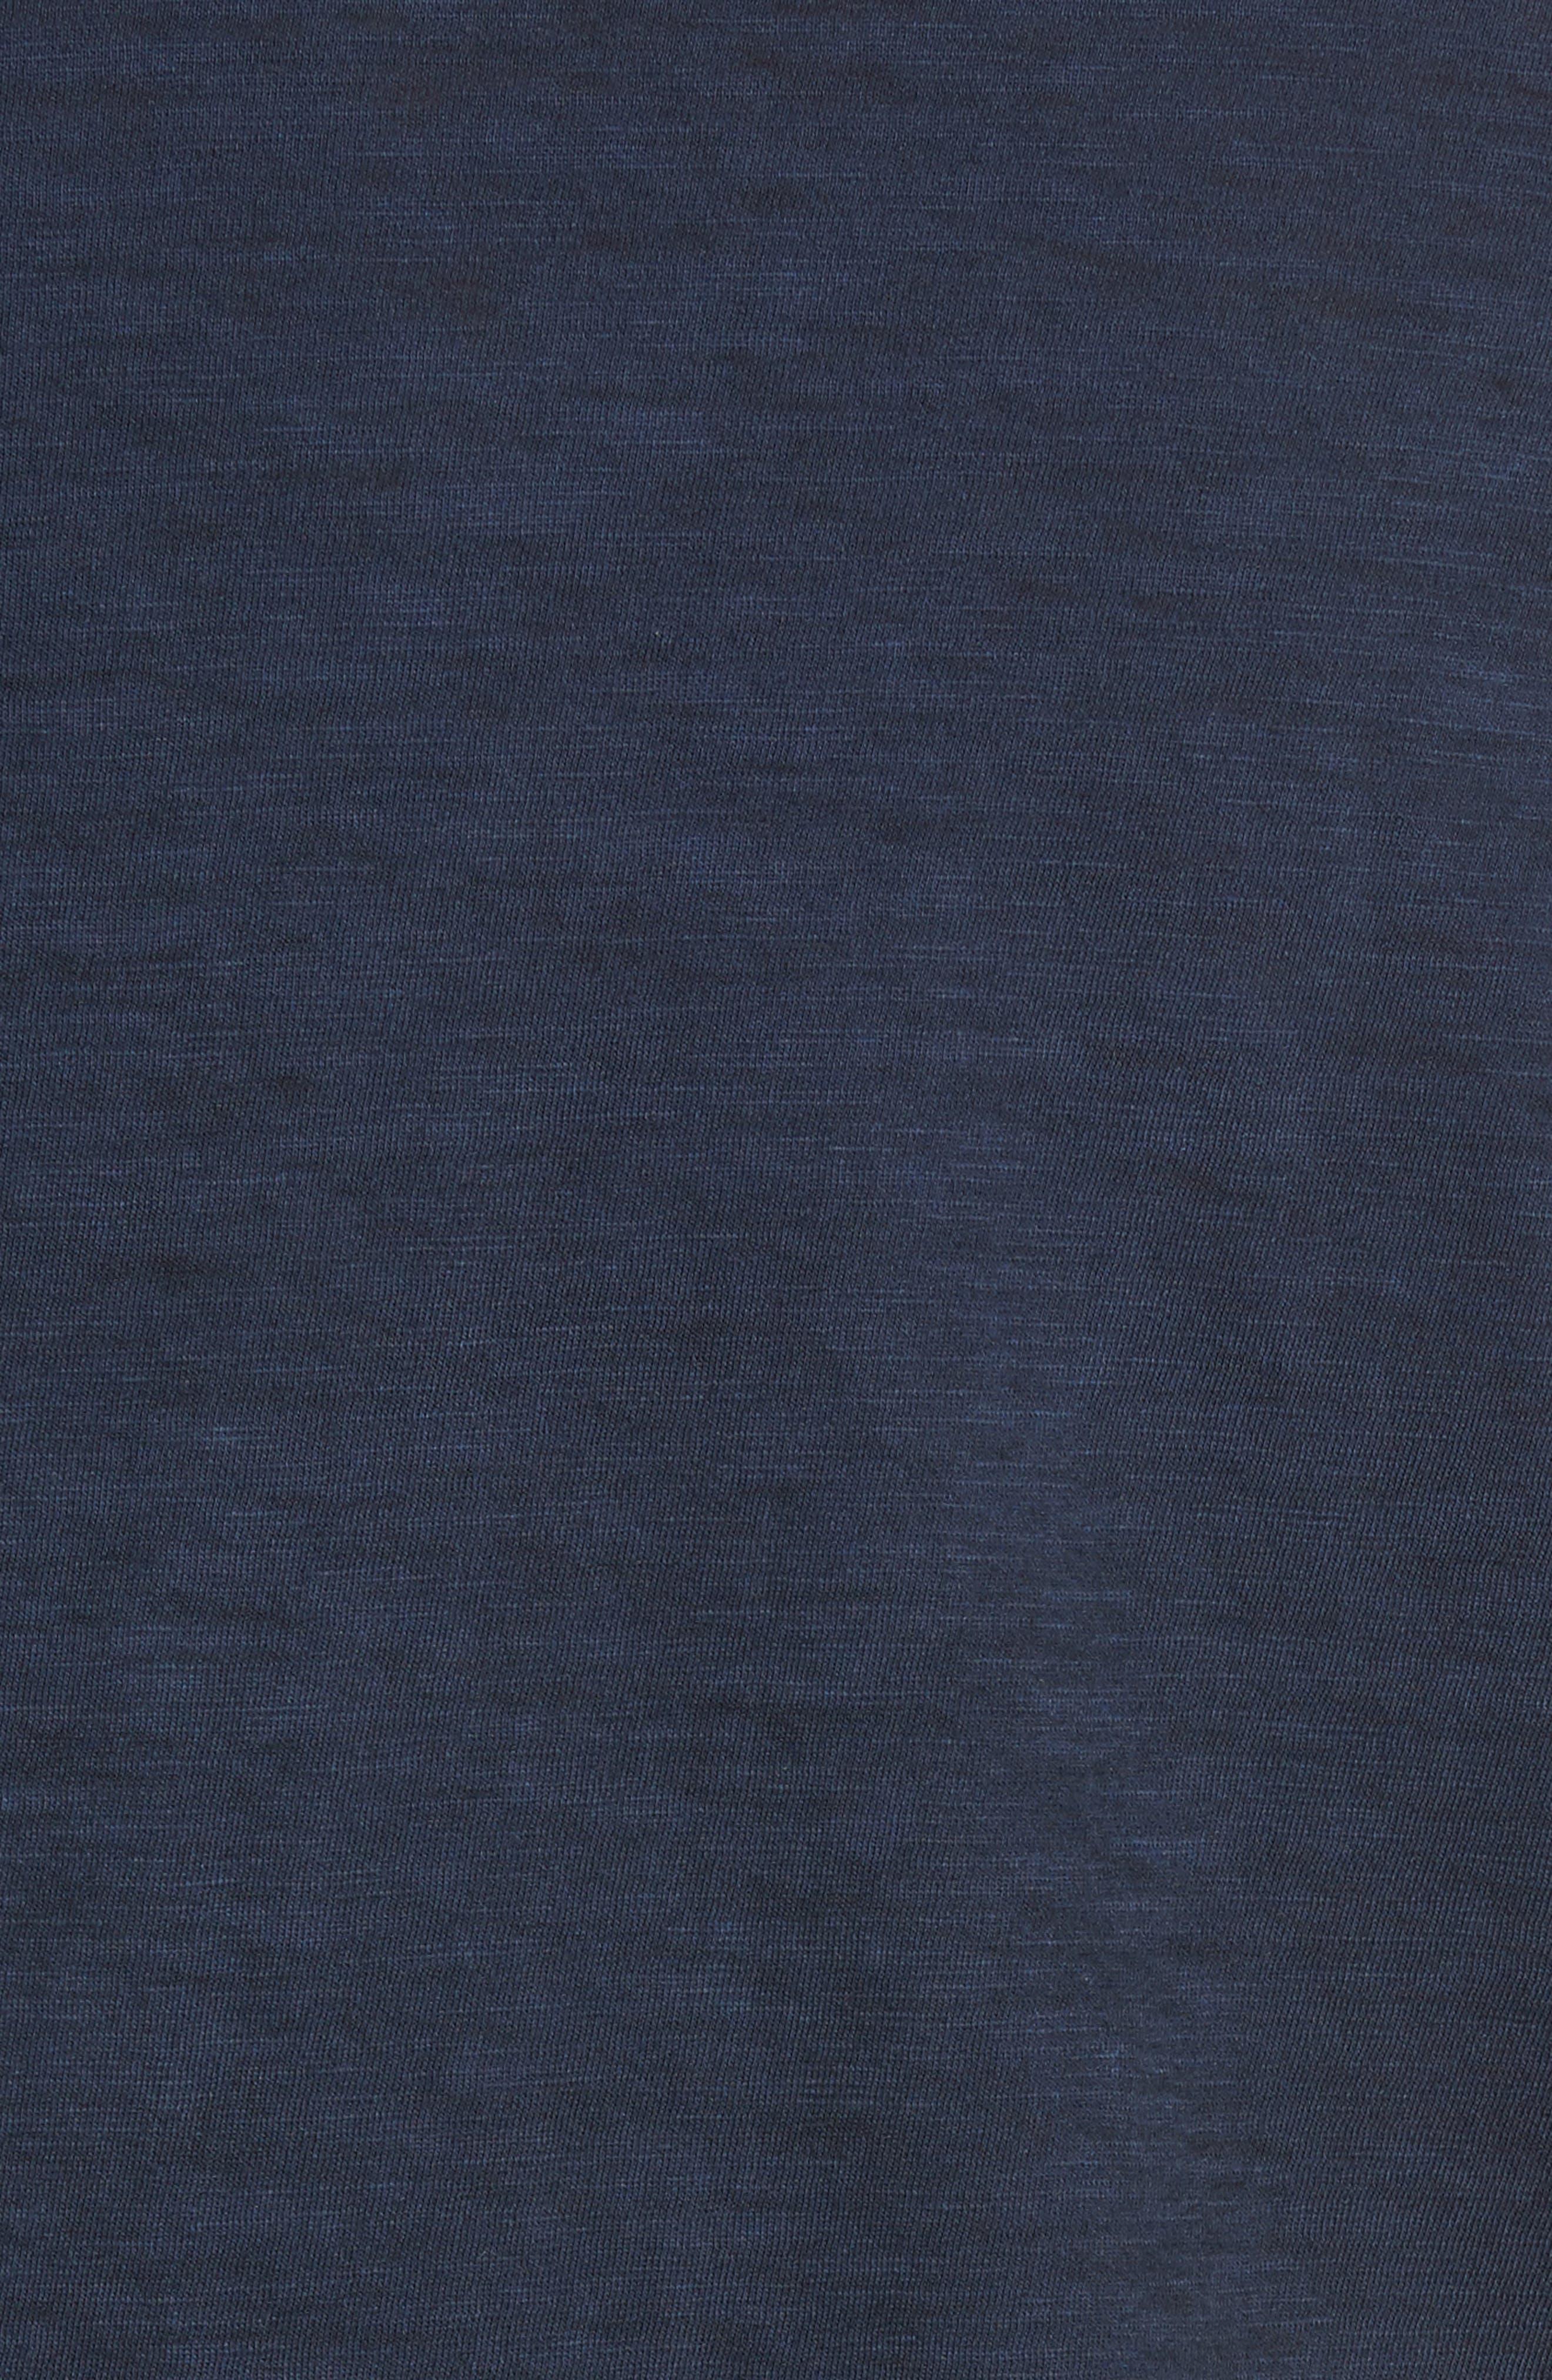 Long Sleeve Cotton Henley,                             Alternate thumbnail 5, color,                             414